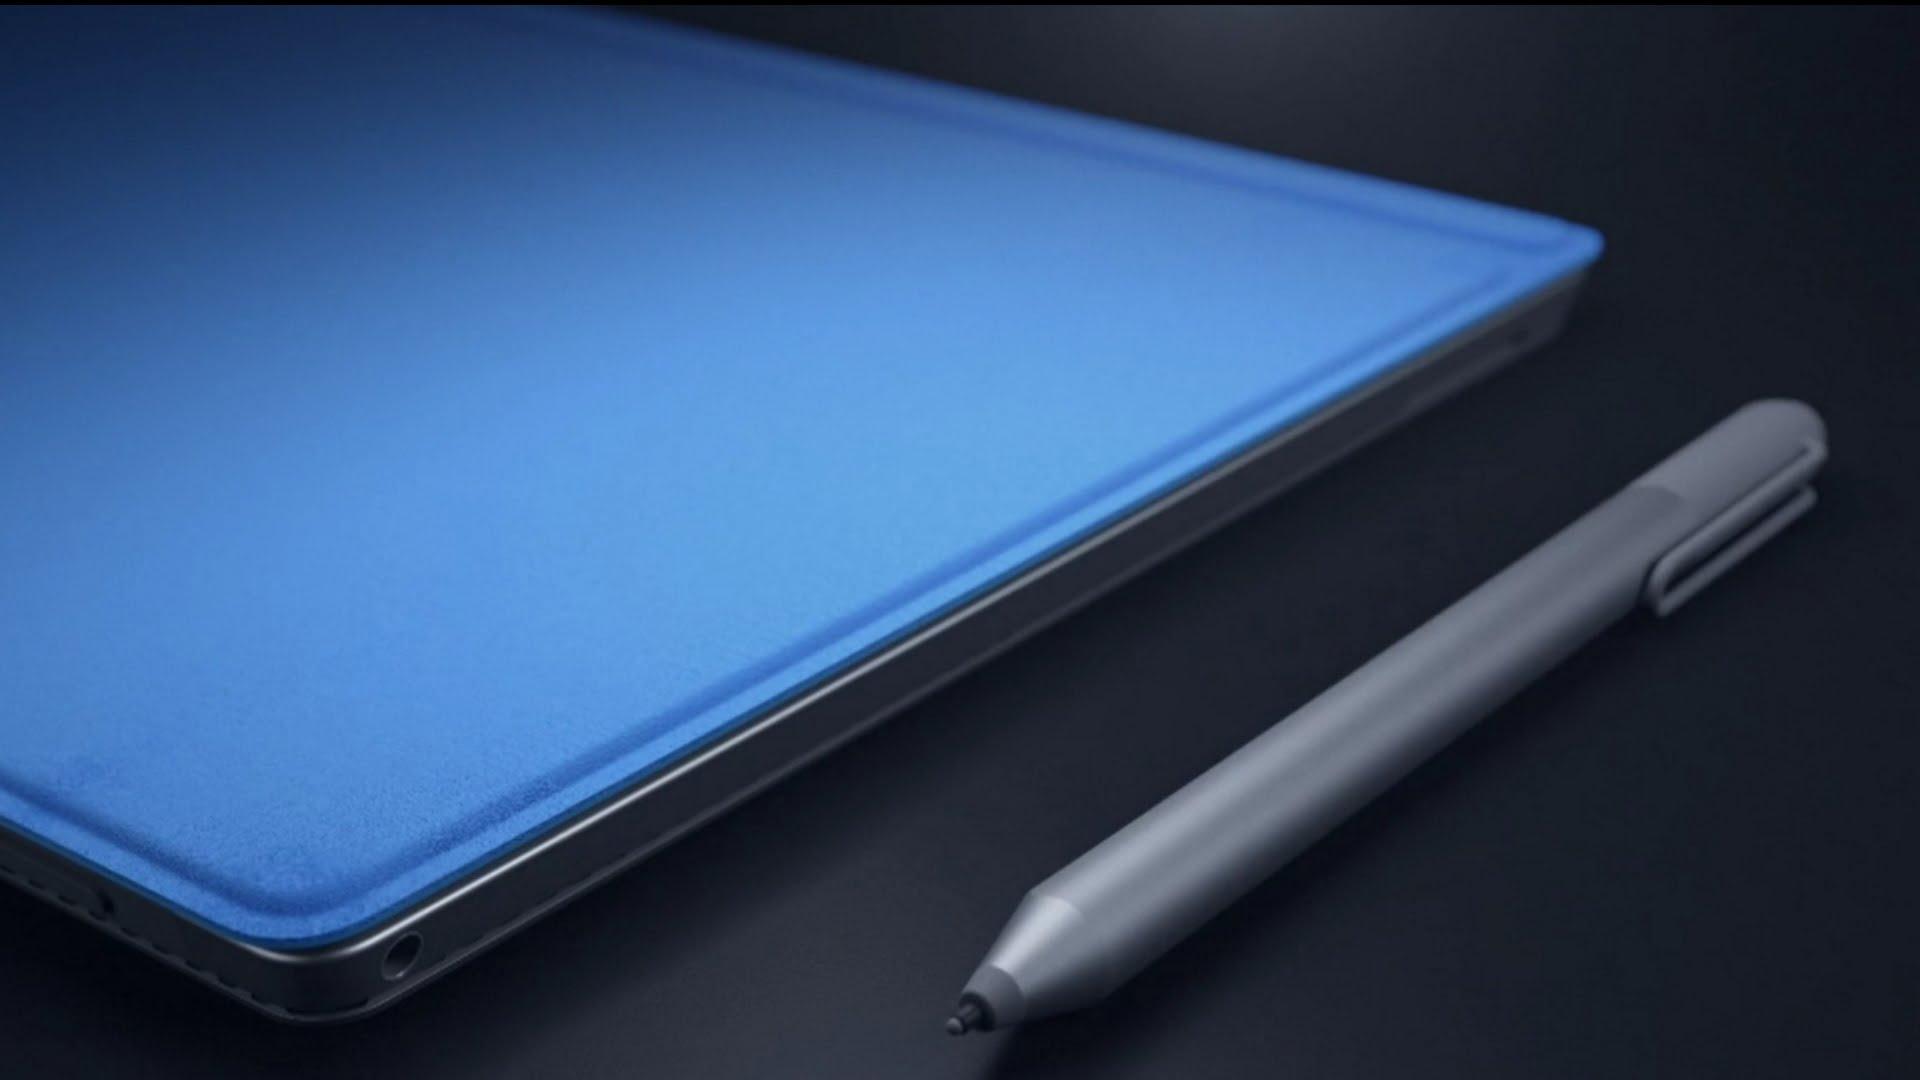 Un nuevo stylus podría llegar a Microsoft Surface